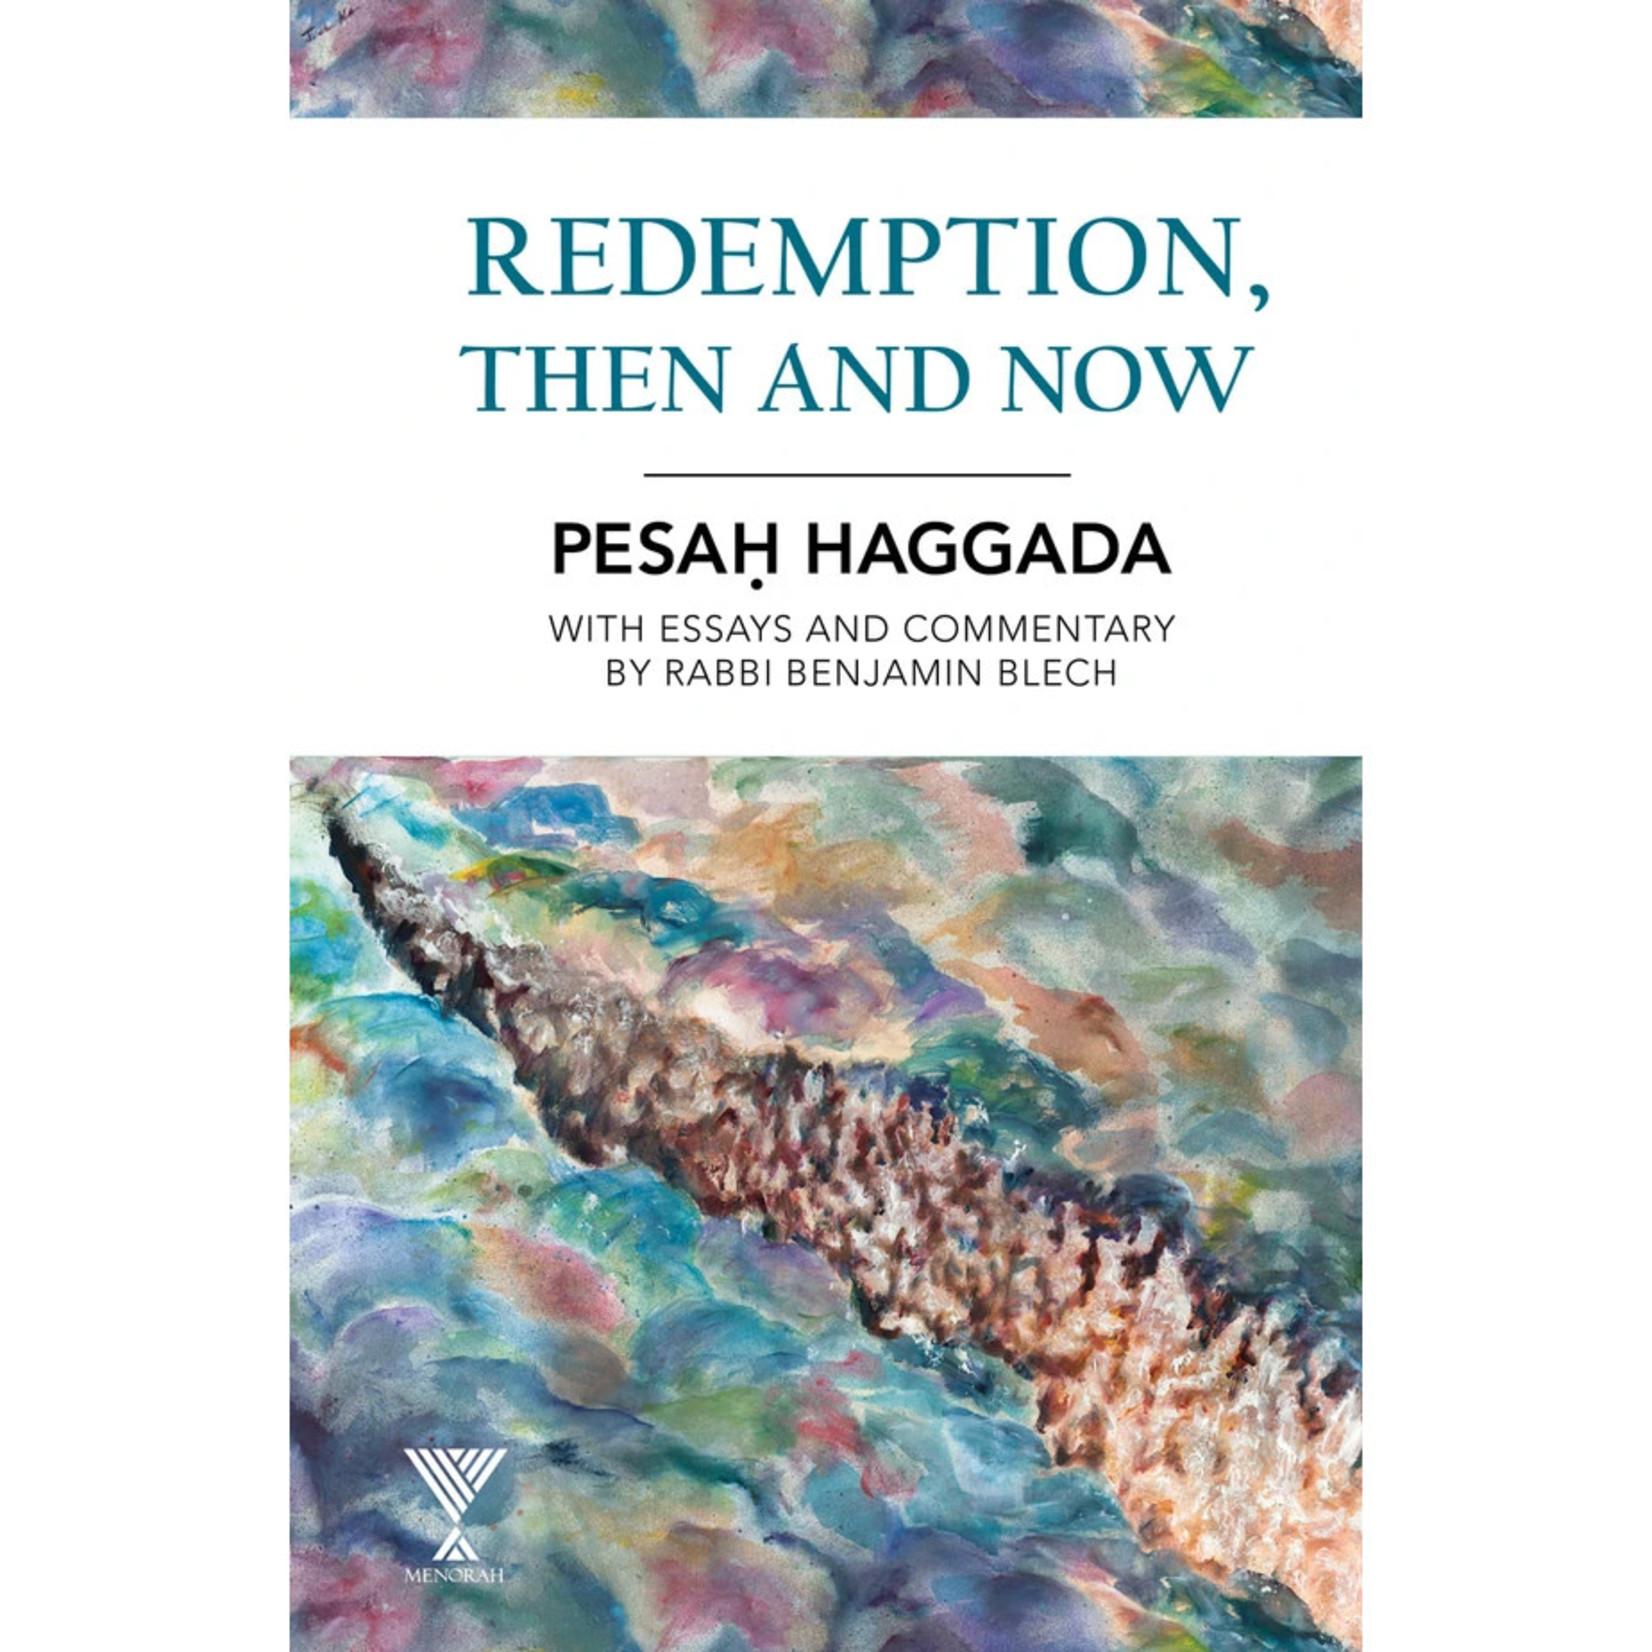 Rabbi Benjamin Blech Redemption, Then and Now - Pesach Haggadah